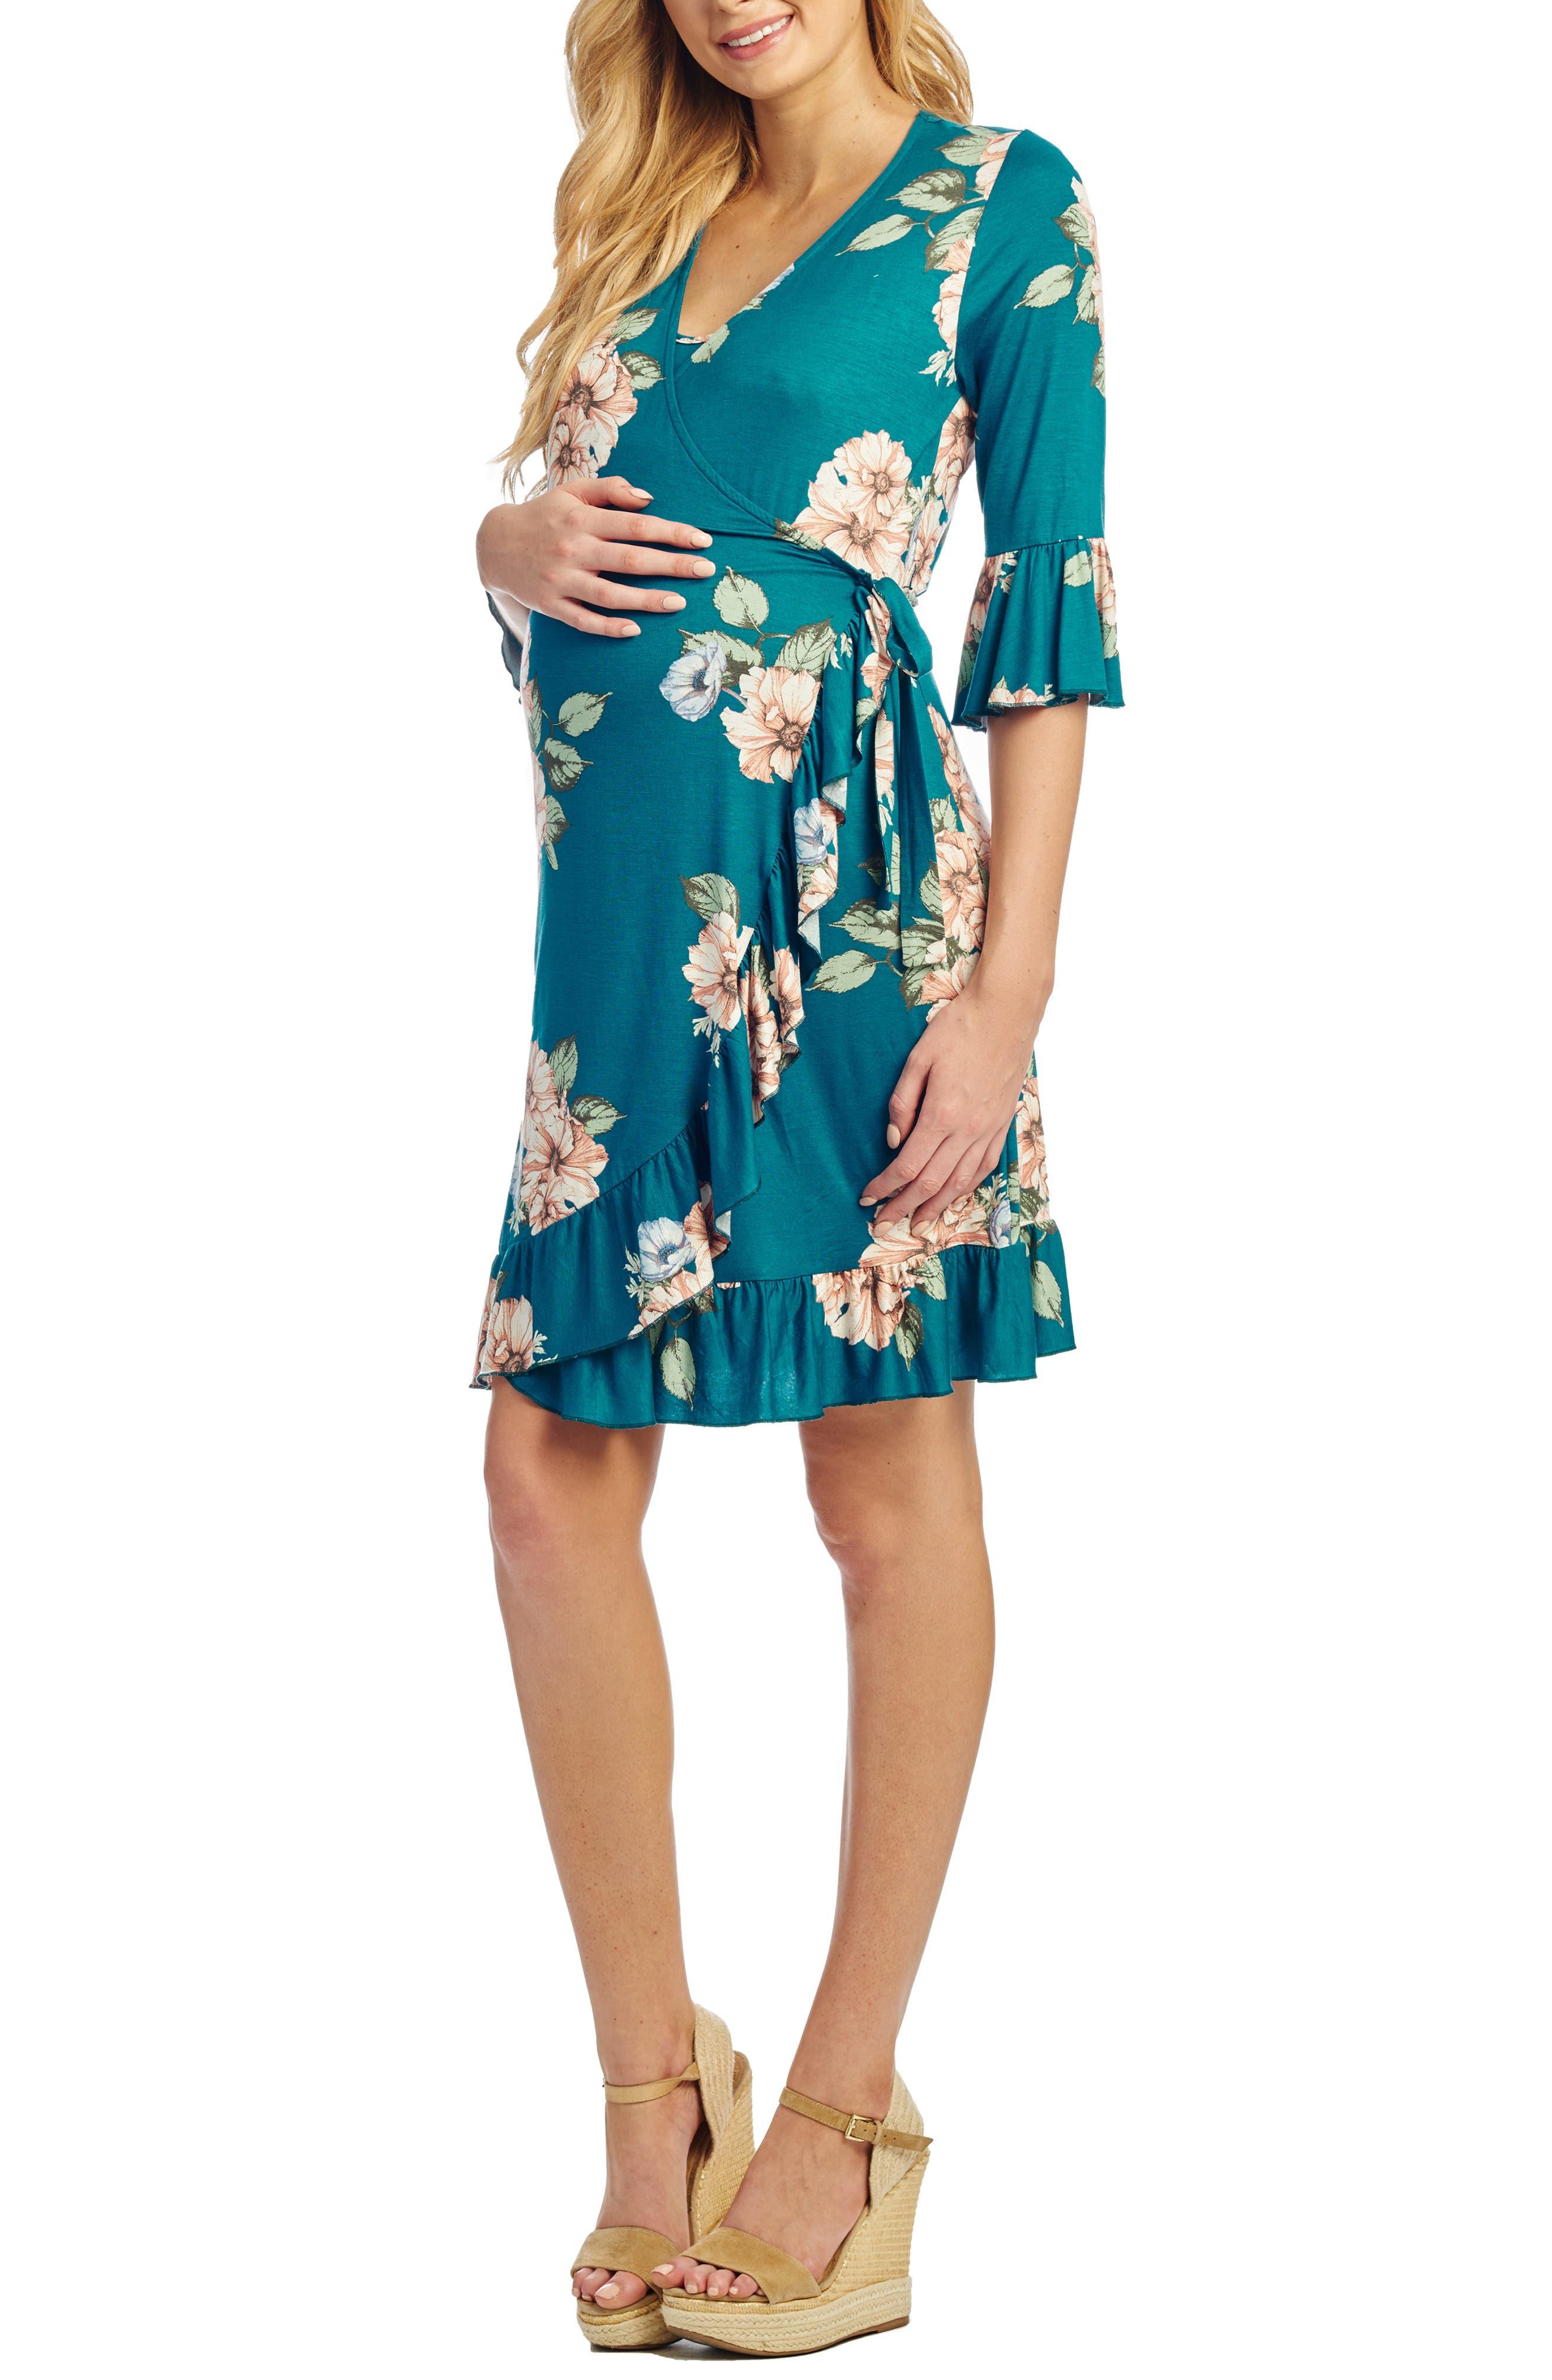 Everly Grey Leilani Maternity/nursing Wrap Dress, Blue/green